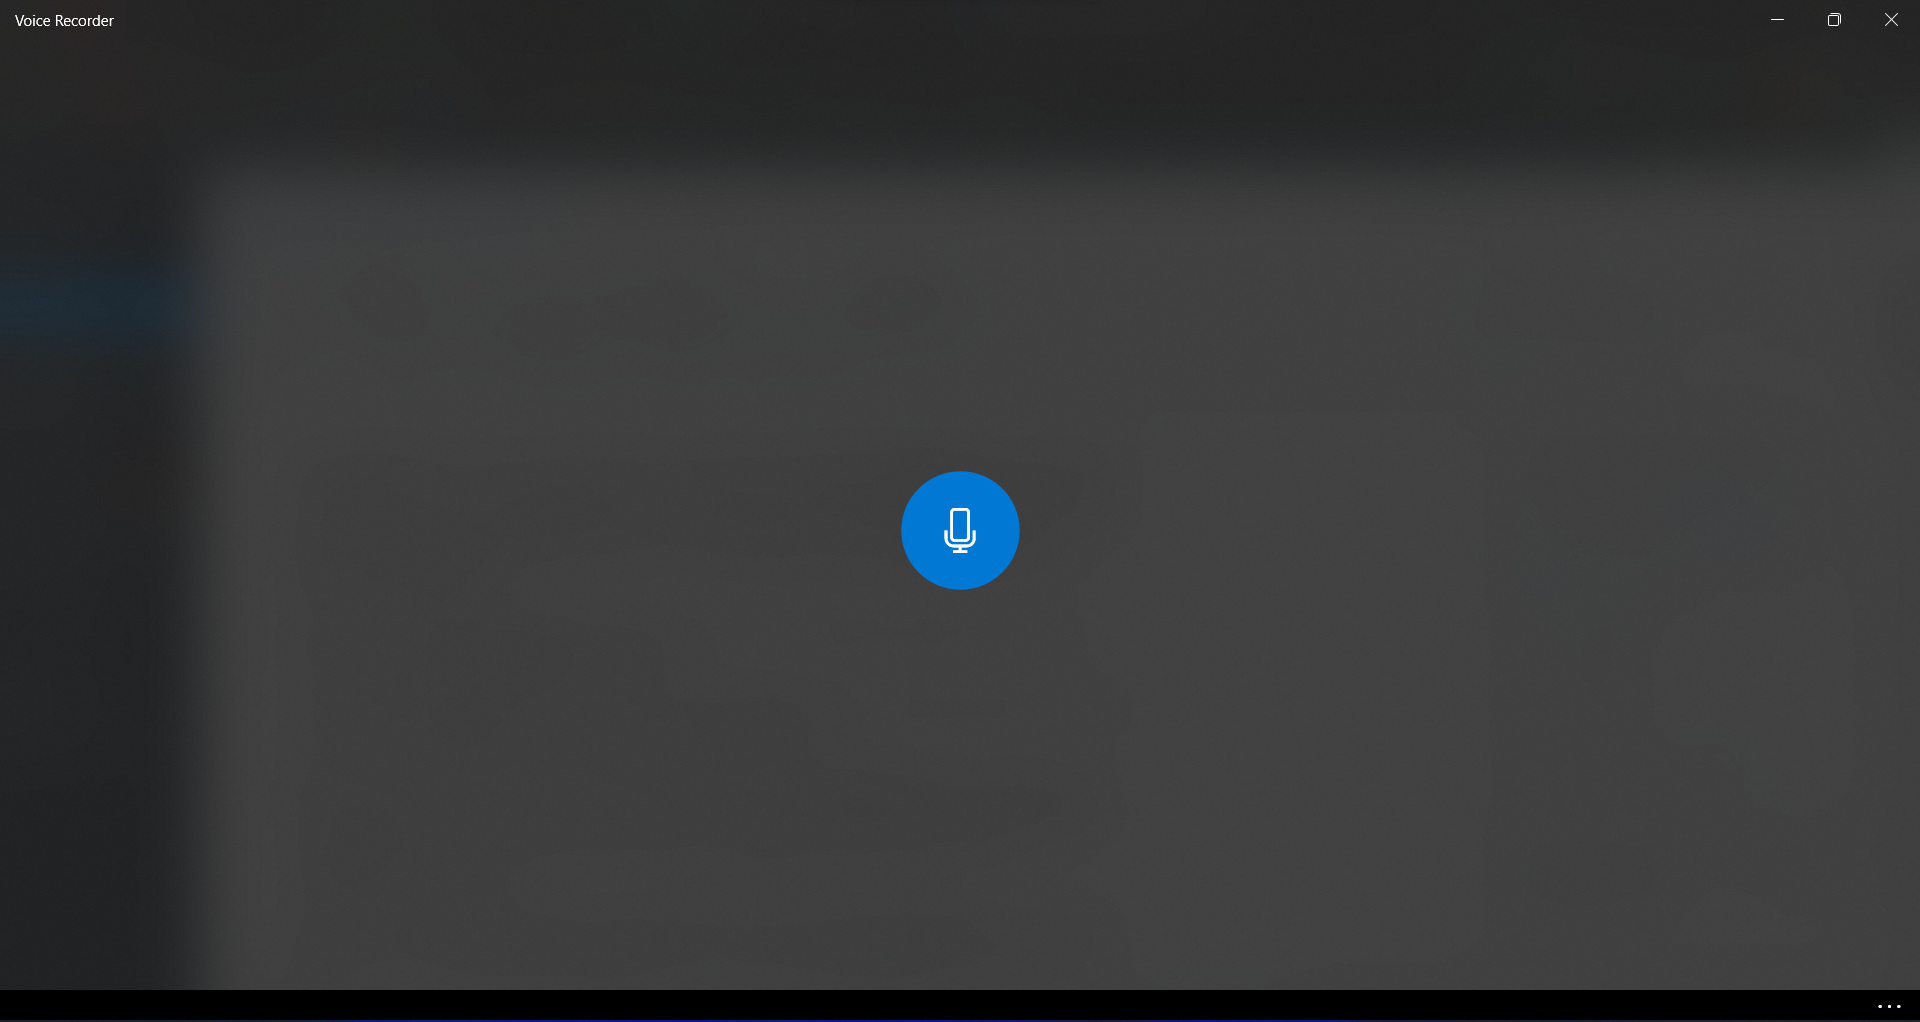 How To Record Audio On Windows 11?